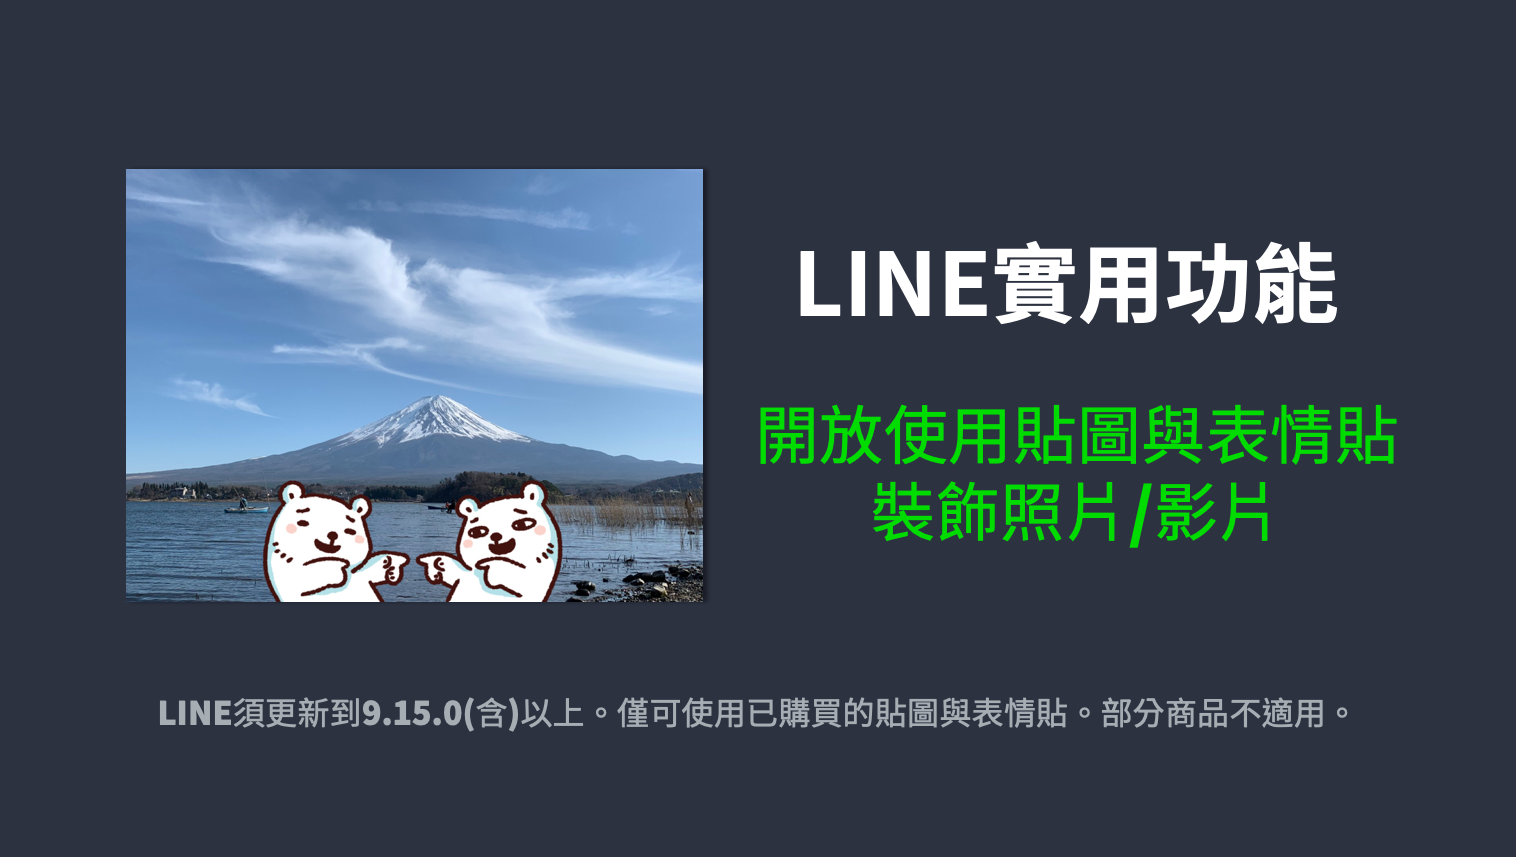 iOS 9.15.0 blog_001